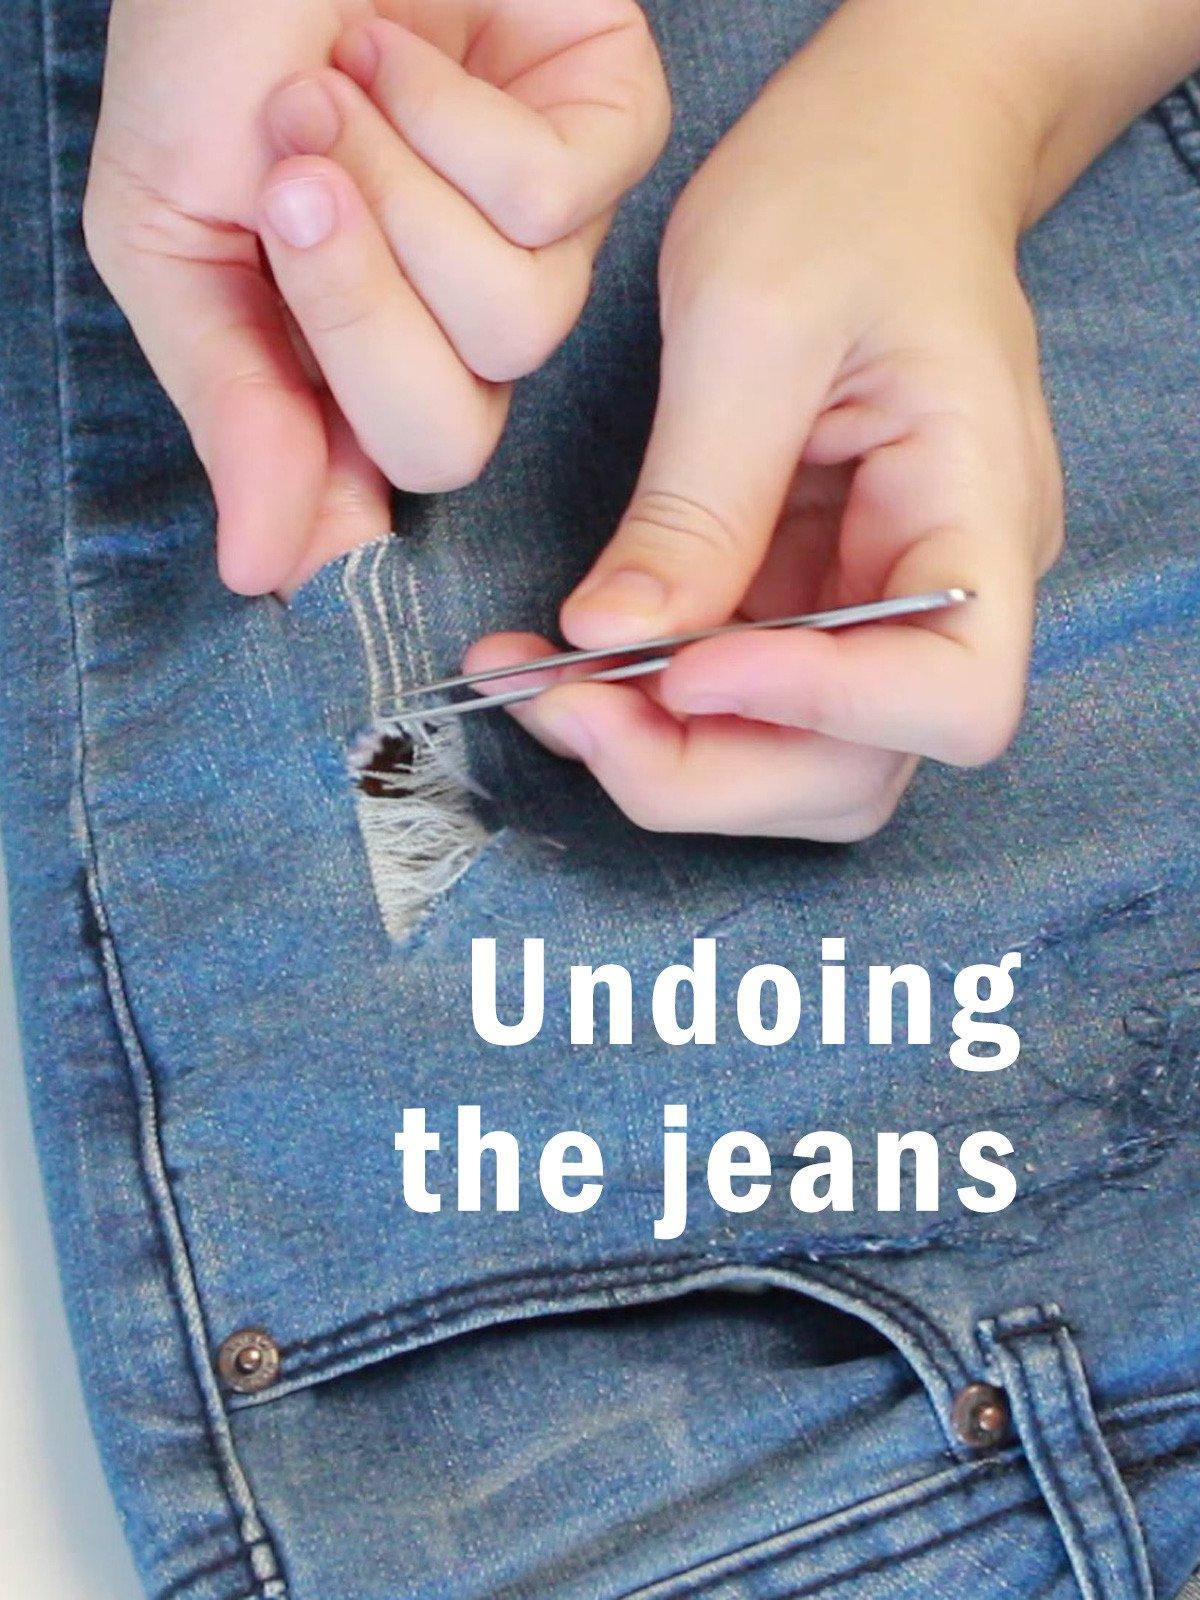 Undoing the jeans